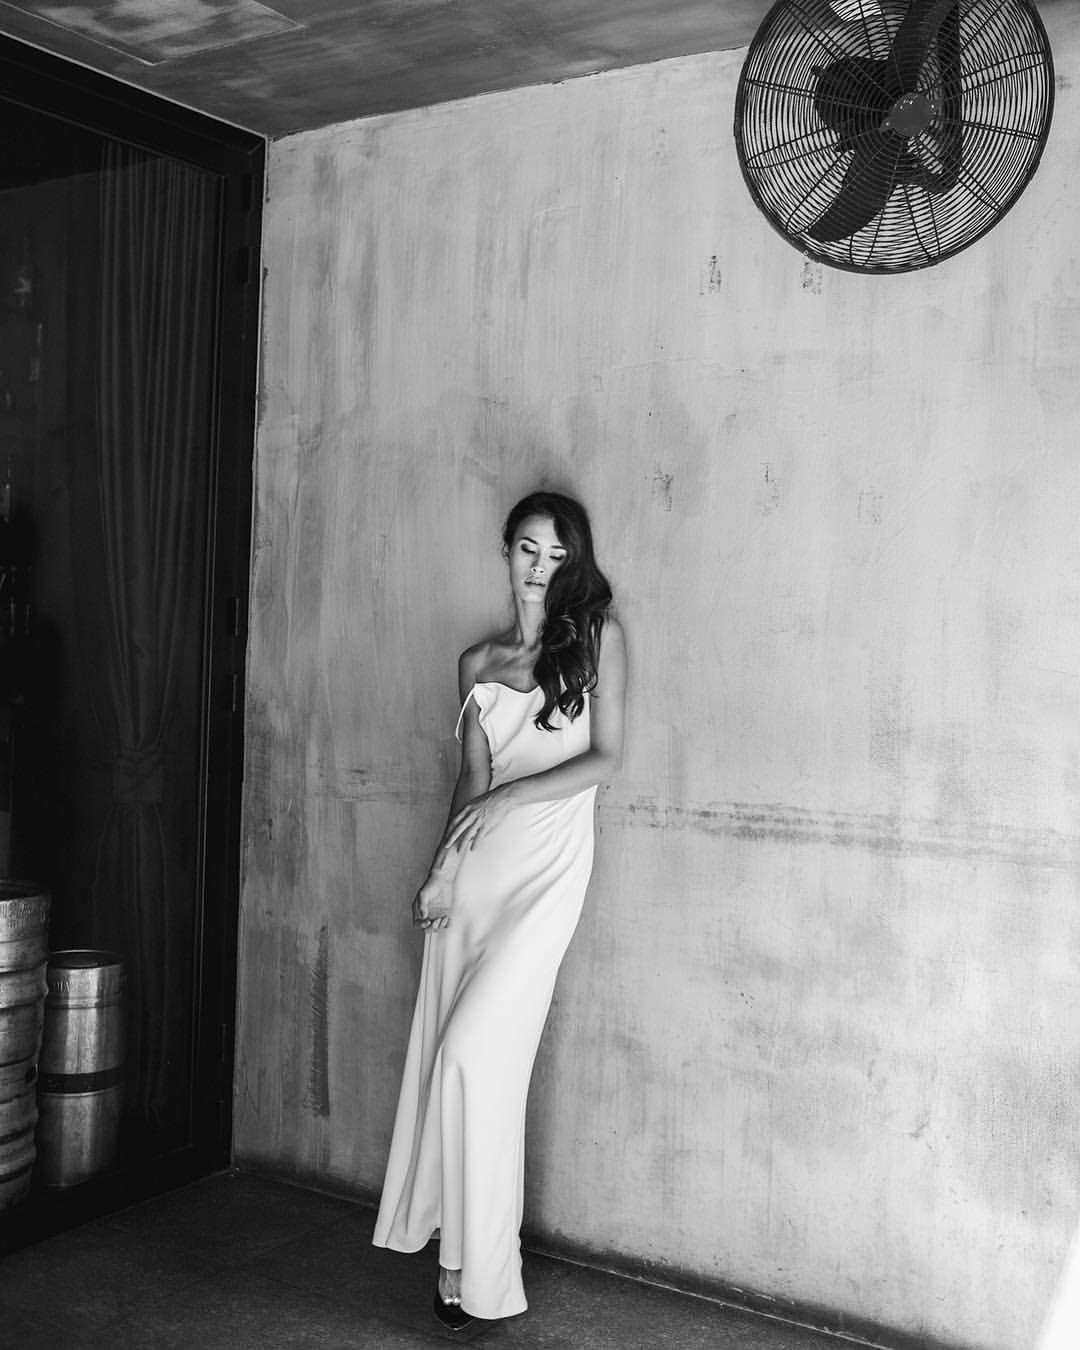 25ae598f87f Hong Kong bride | Danilo & Sharon │ Wedding Photography for modern ...